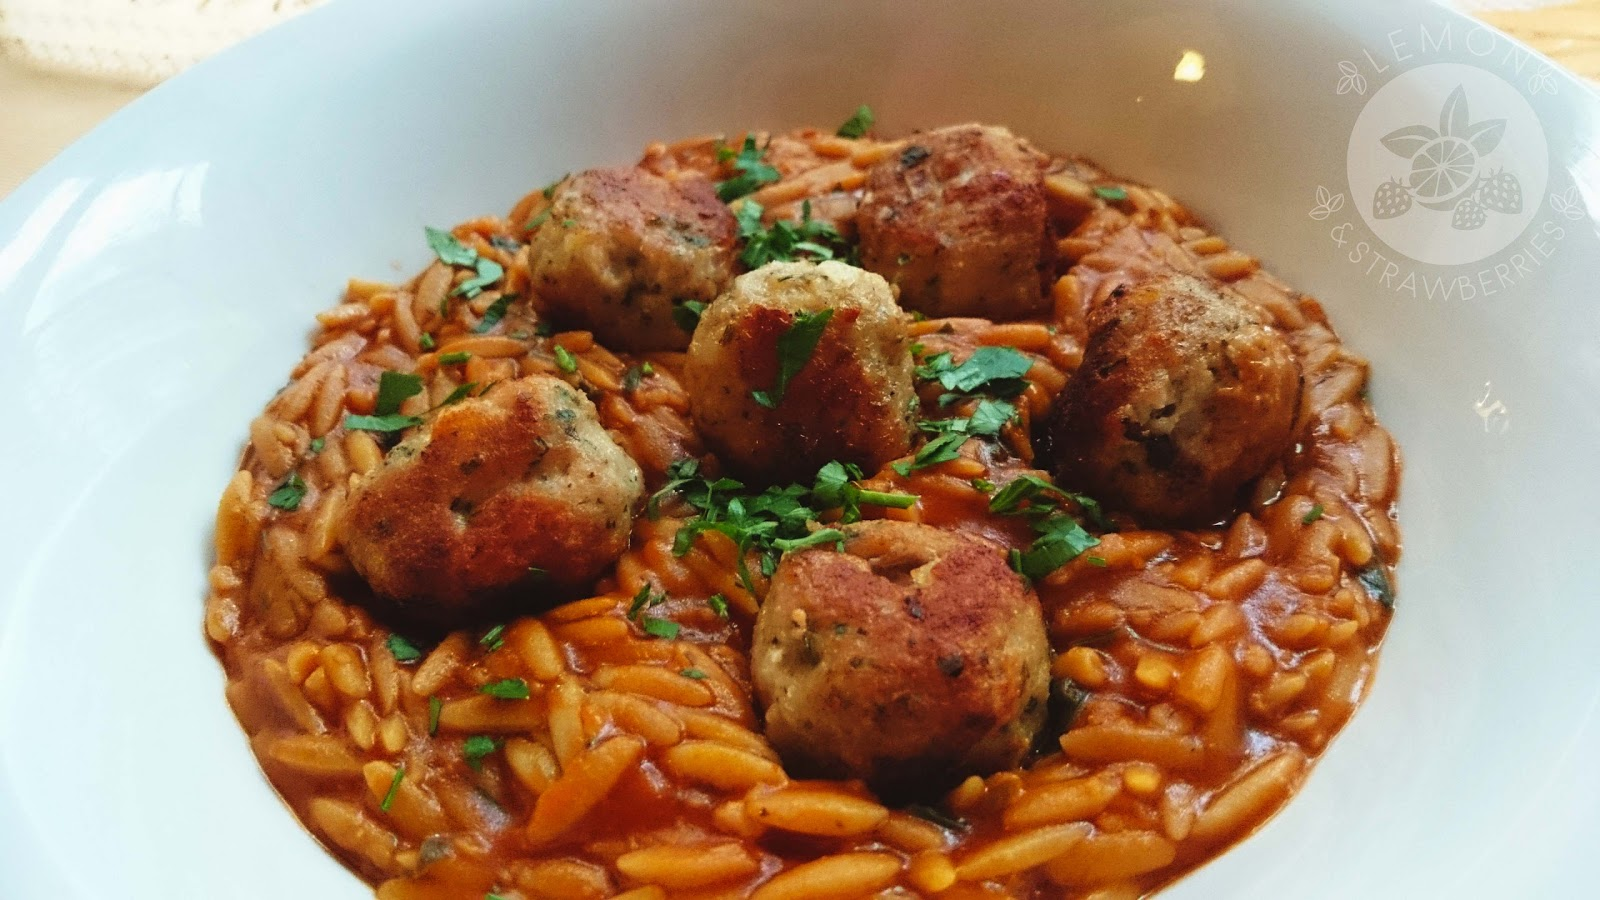 Greek meatballs & kritharaki (orzo) in tomato sauce